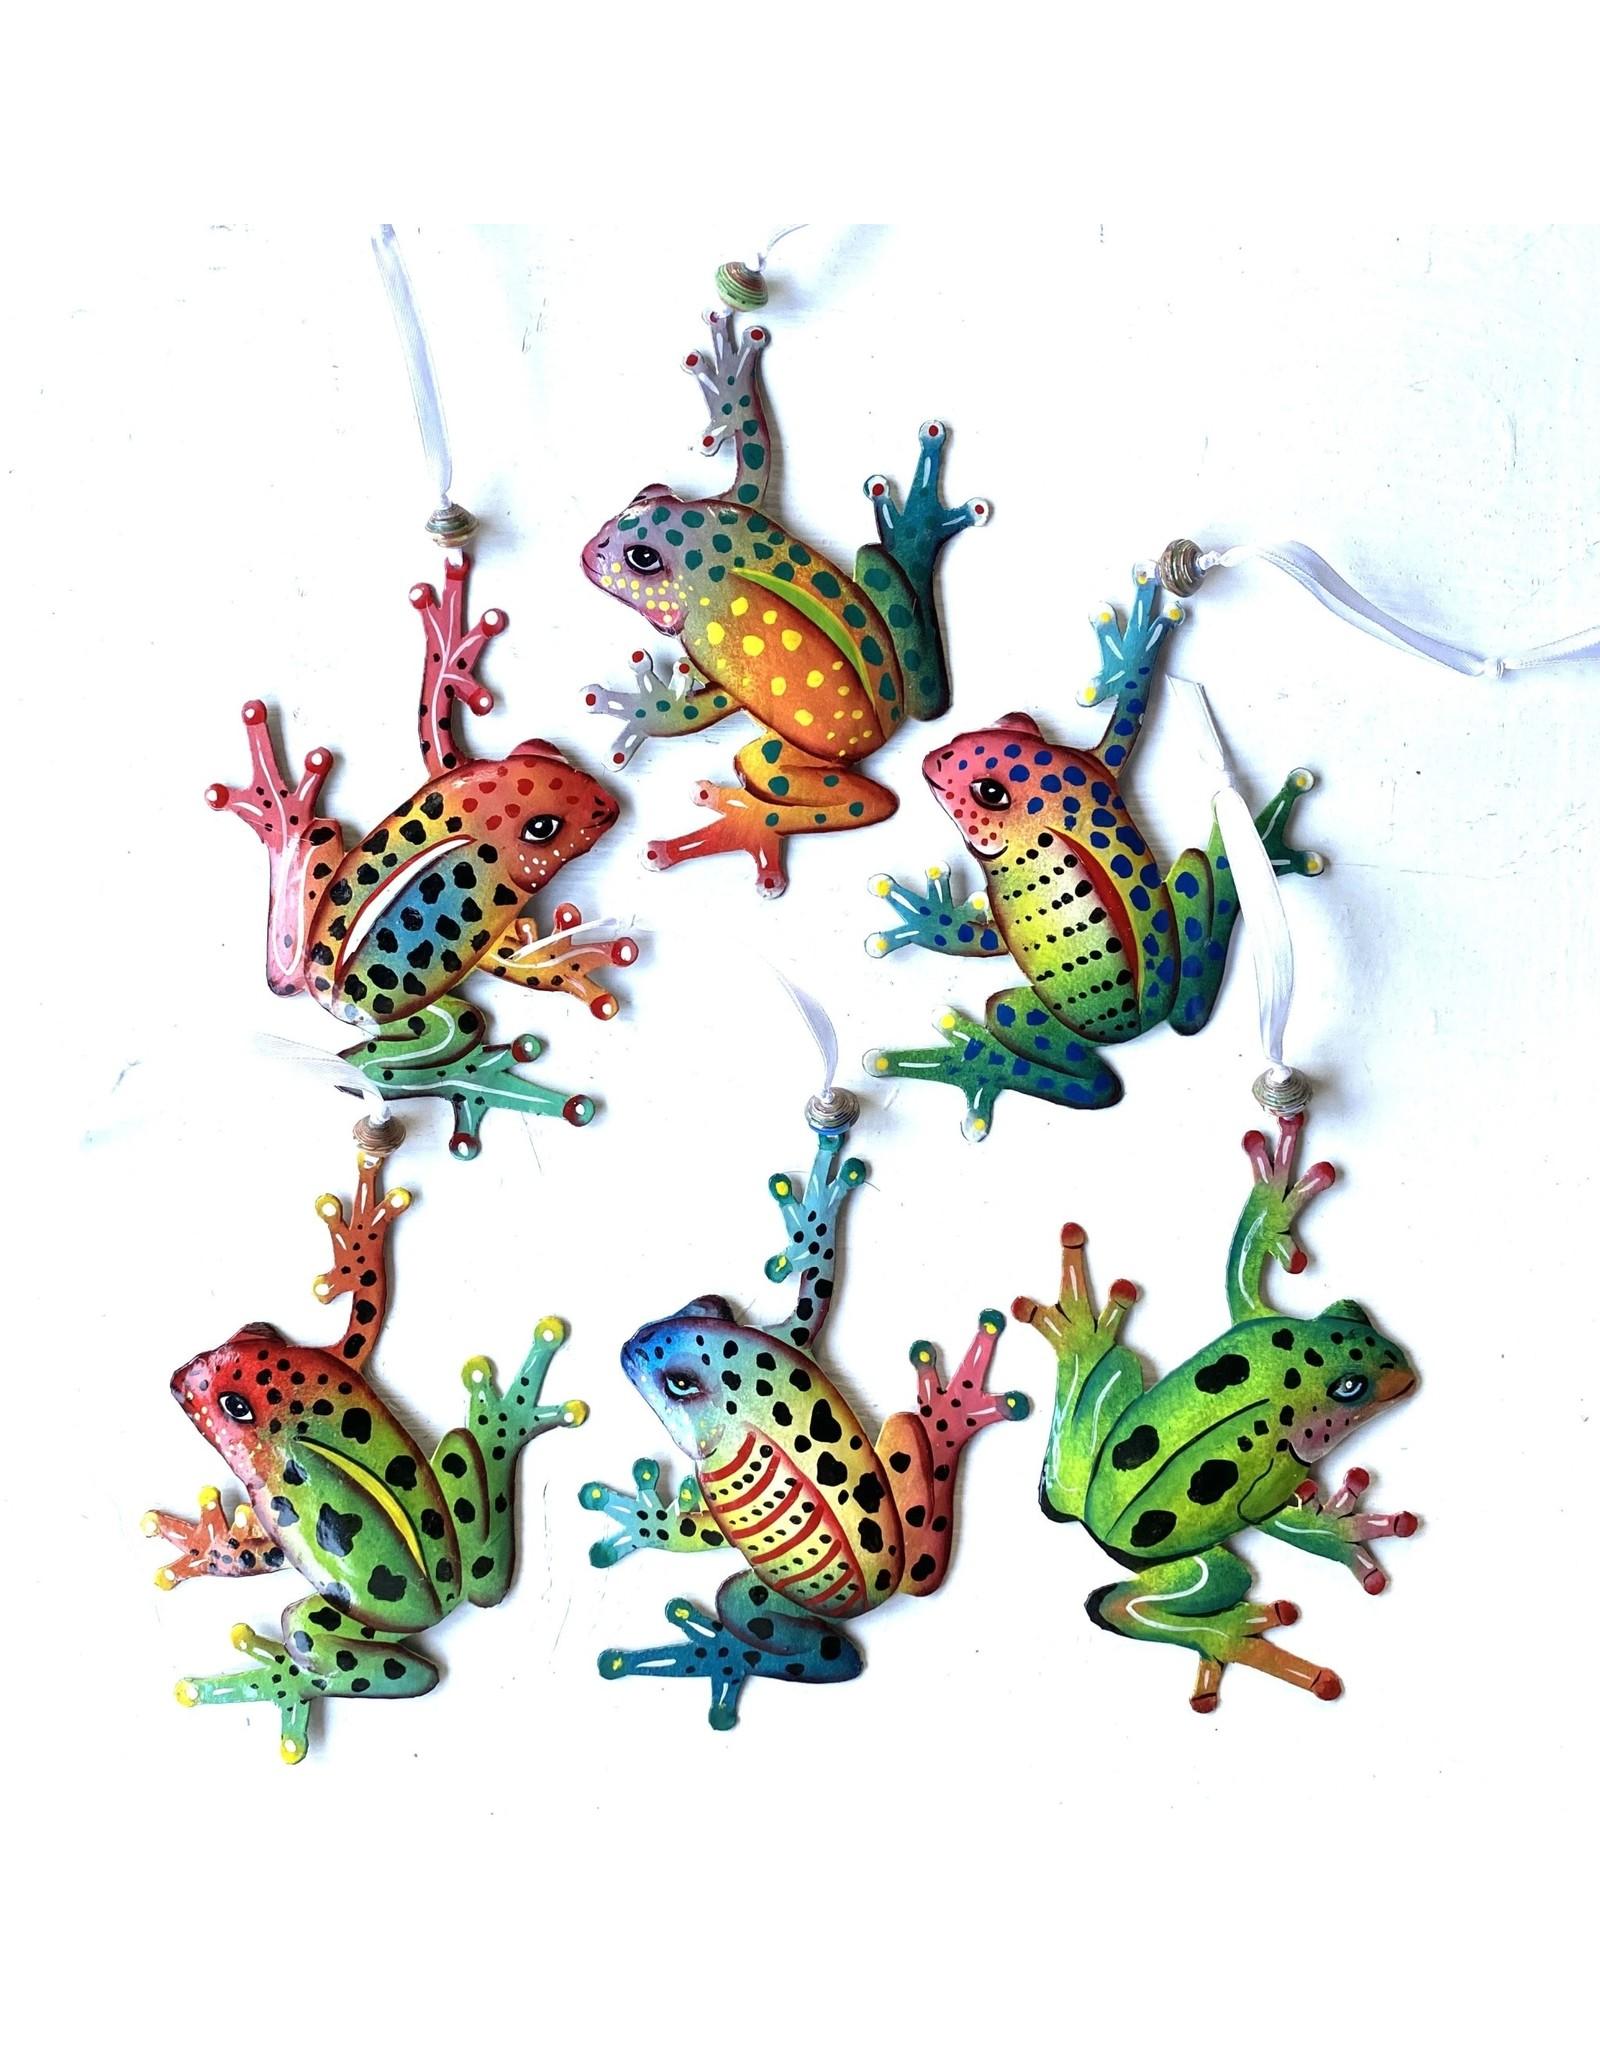 Papillon Painted metal Frog ornaments, asst, Haiti.